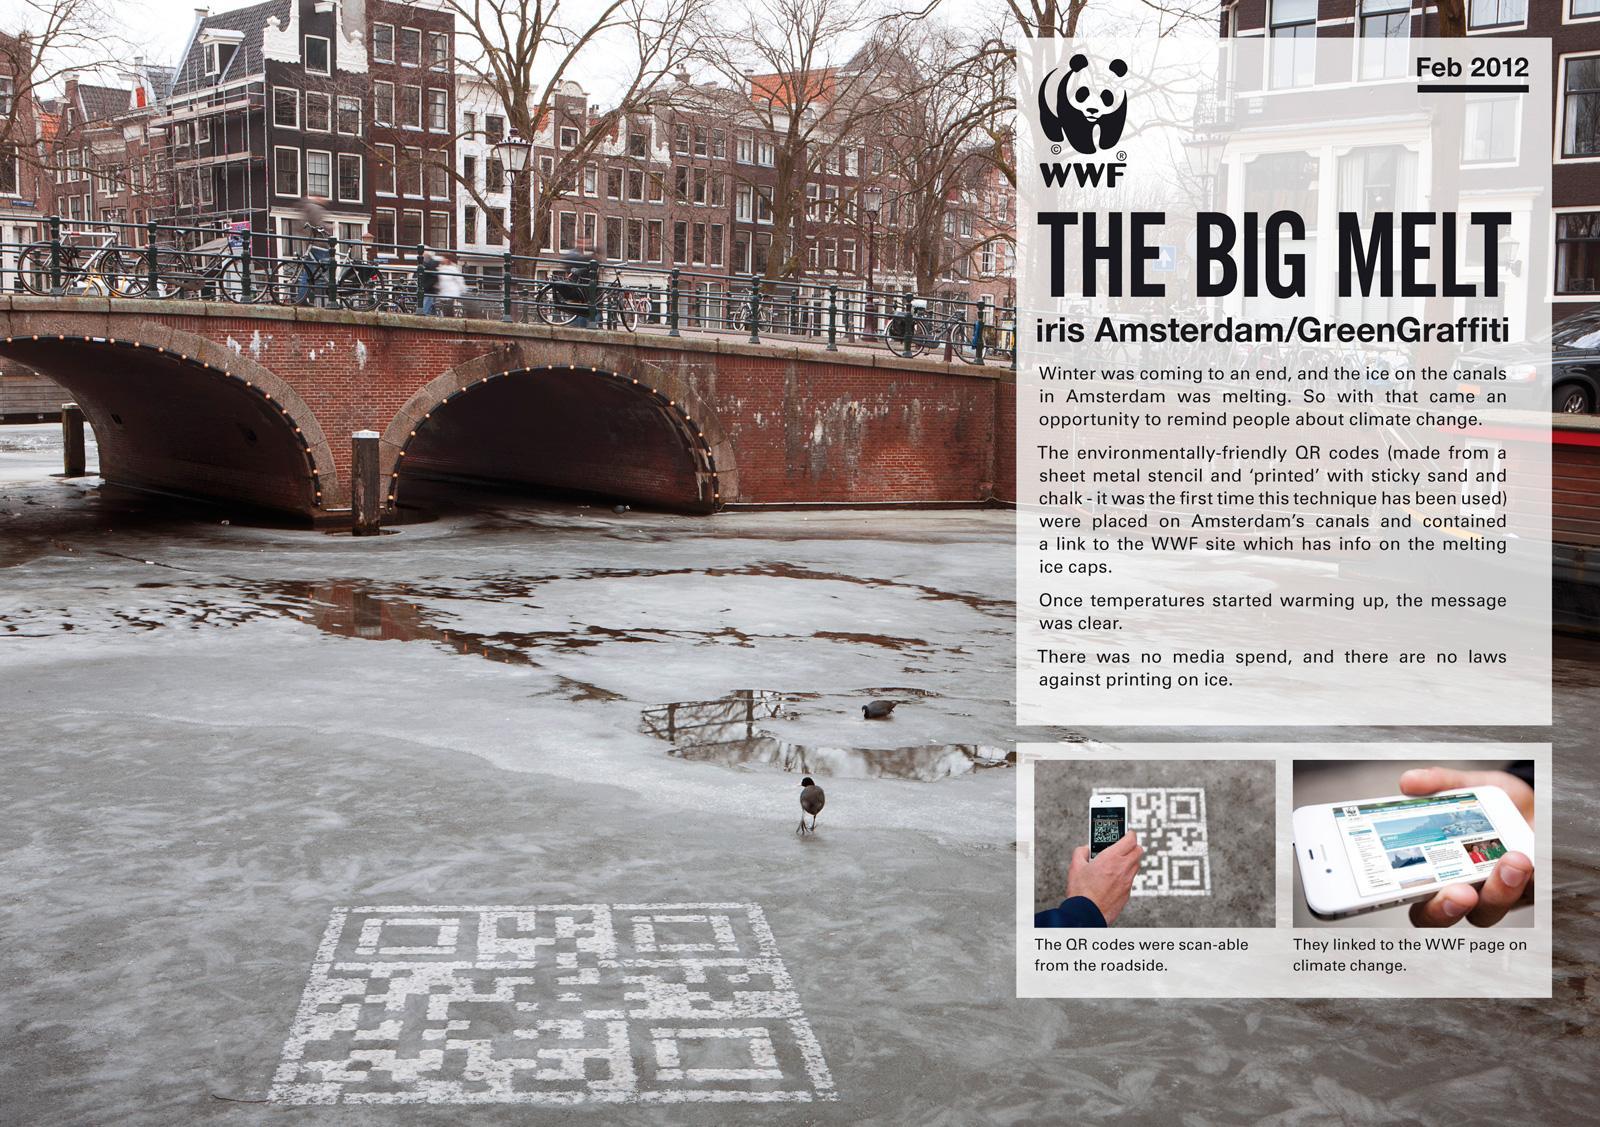 WWF Ambient Ad -  The Big Melt